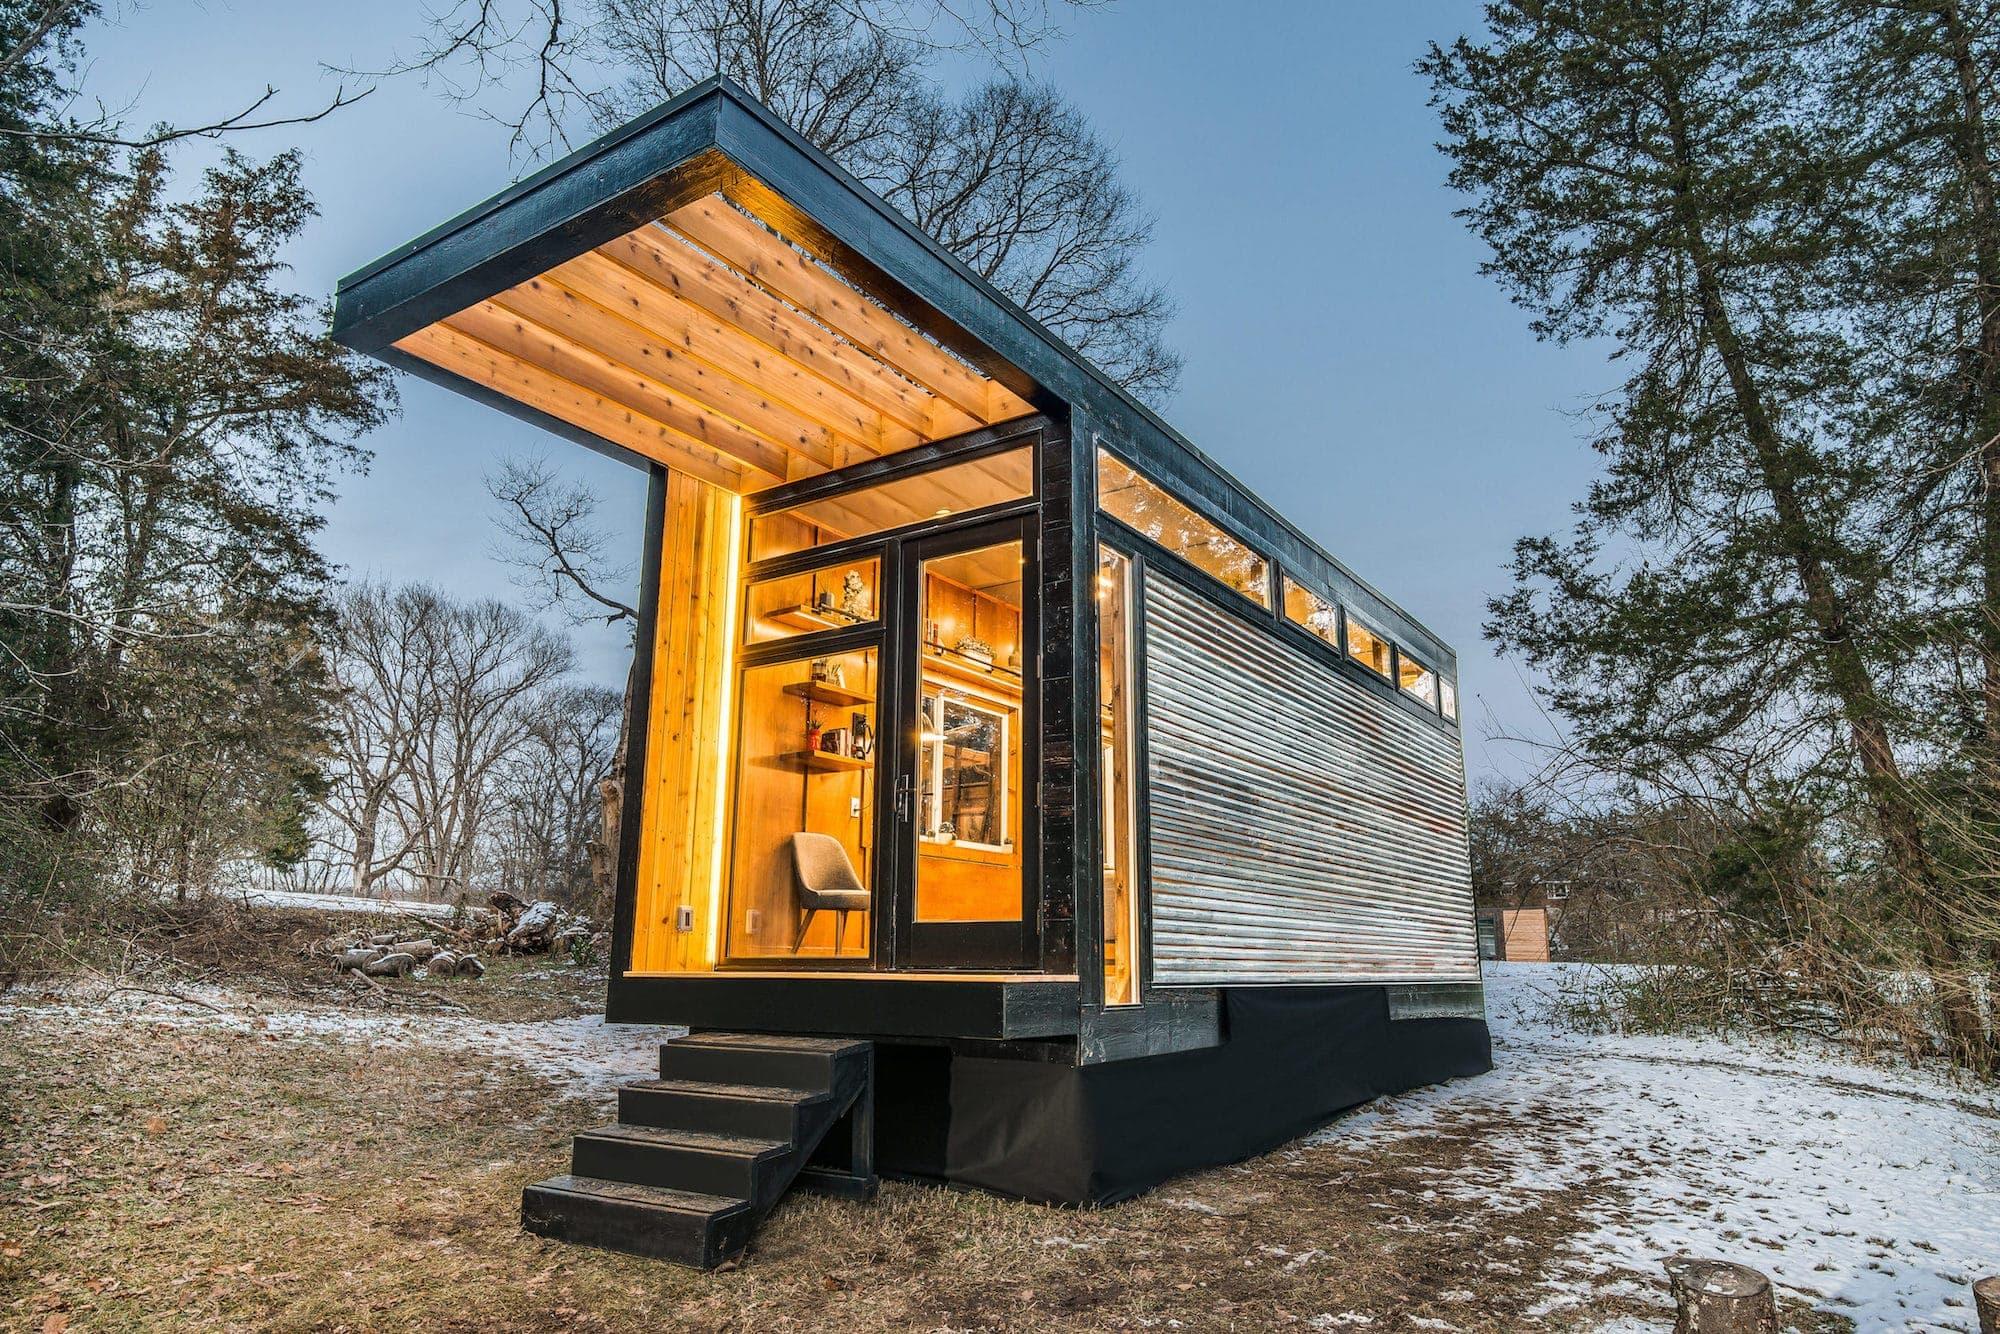 Ein sonderbares Refugium inmitten der Natur: The Cornelia Tiny House 2